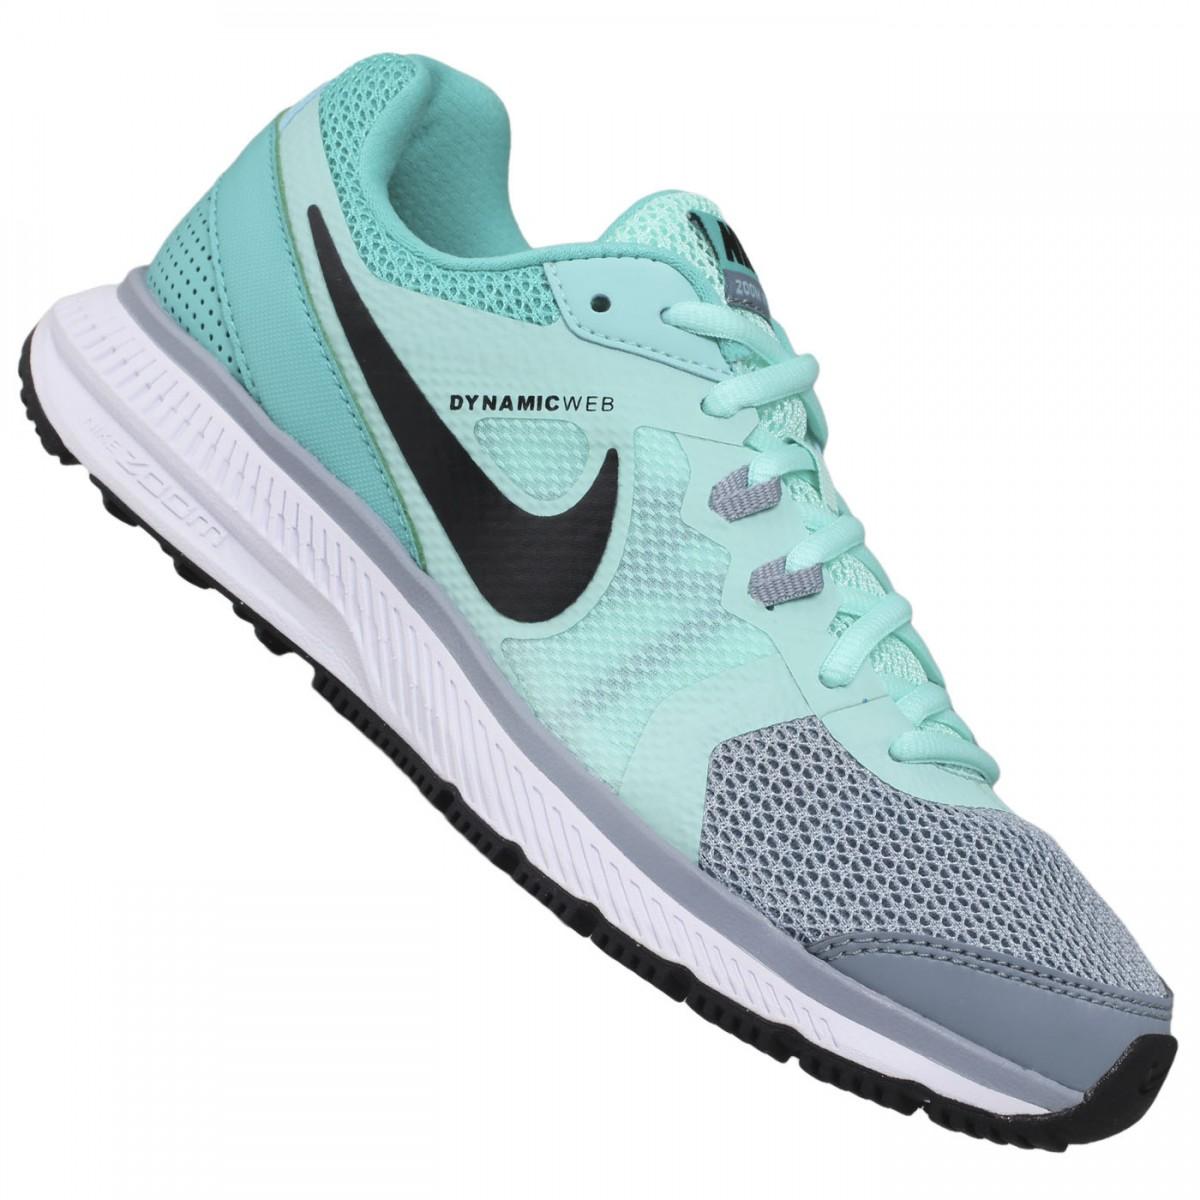 b8c0b03f69 Tênis Nike Zoom Winflo MSL - Feminino